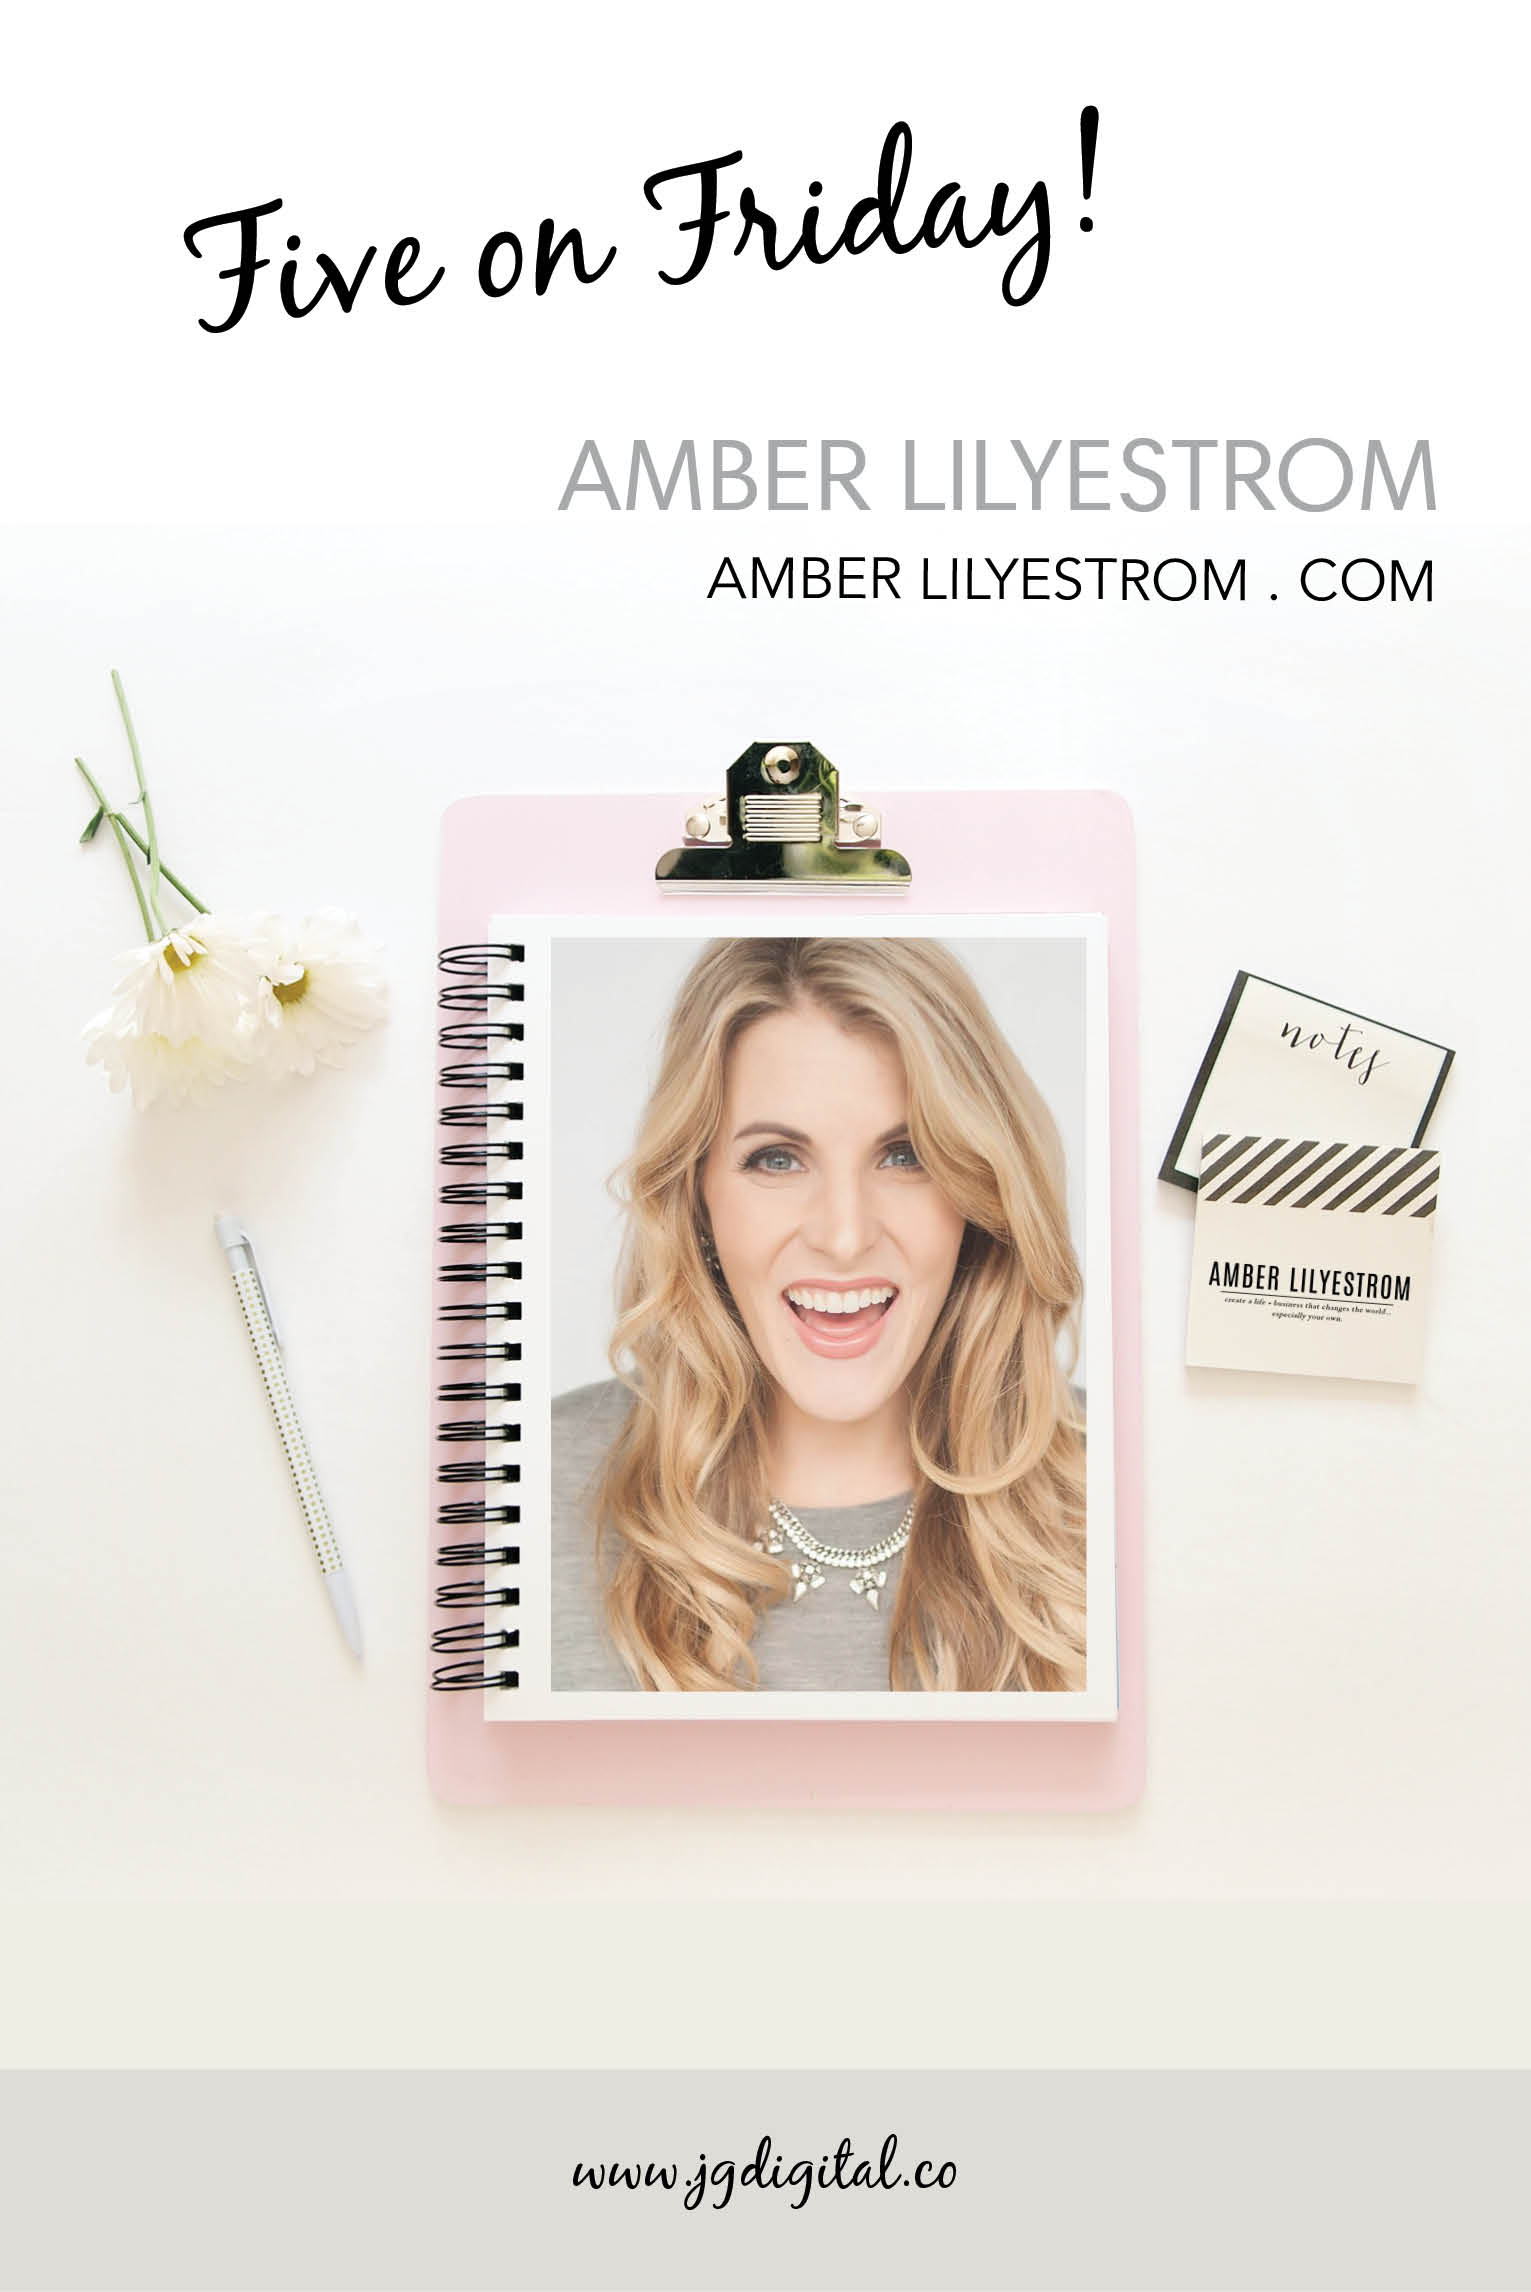 Amber Lilyestrom